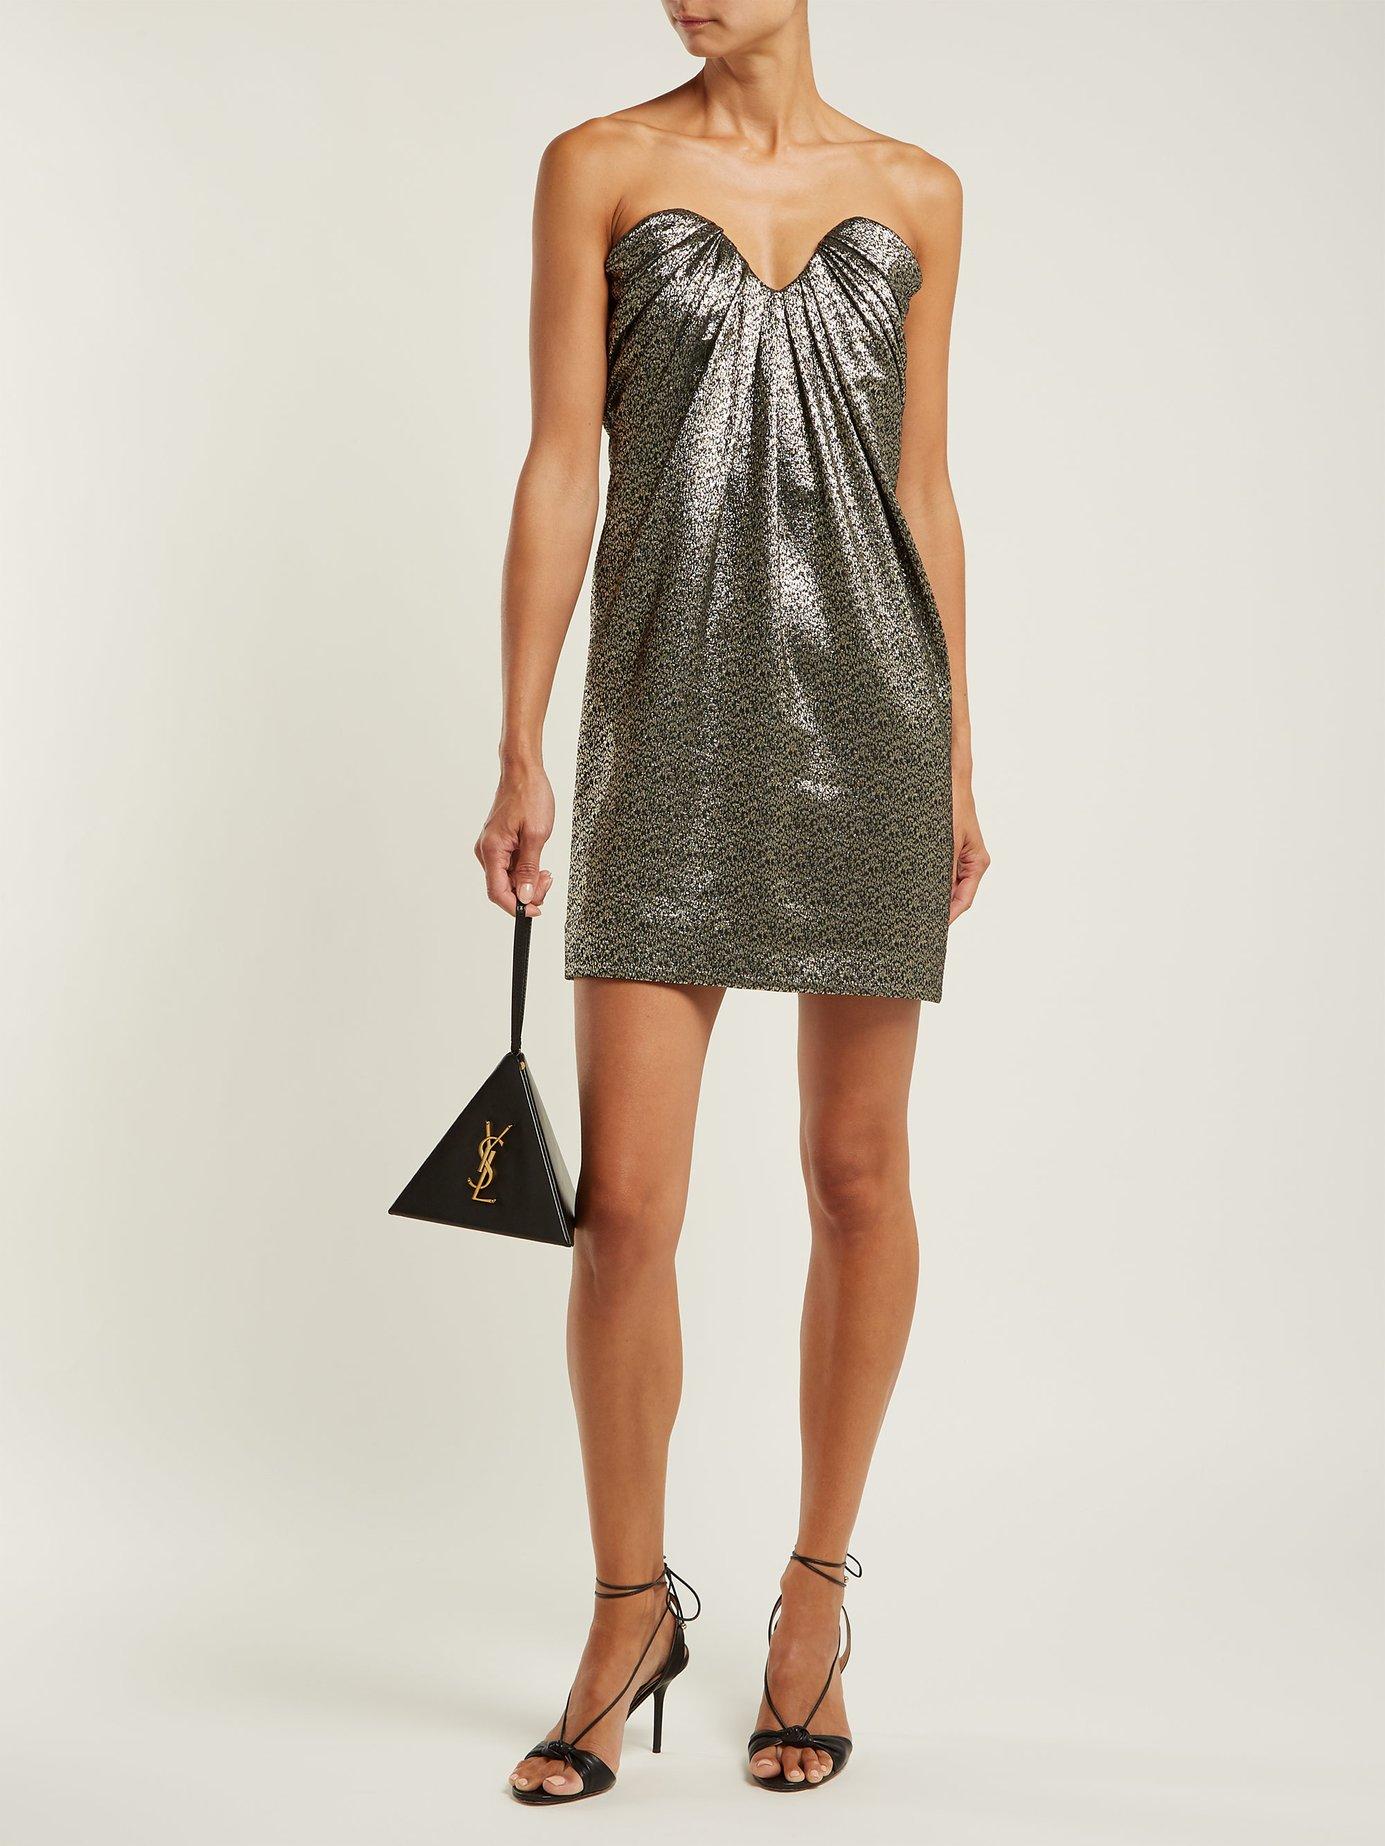 Strapless metallic jacquard mini dress by Saint Laurent